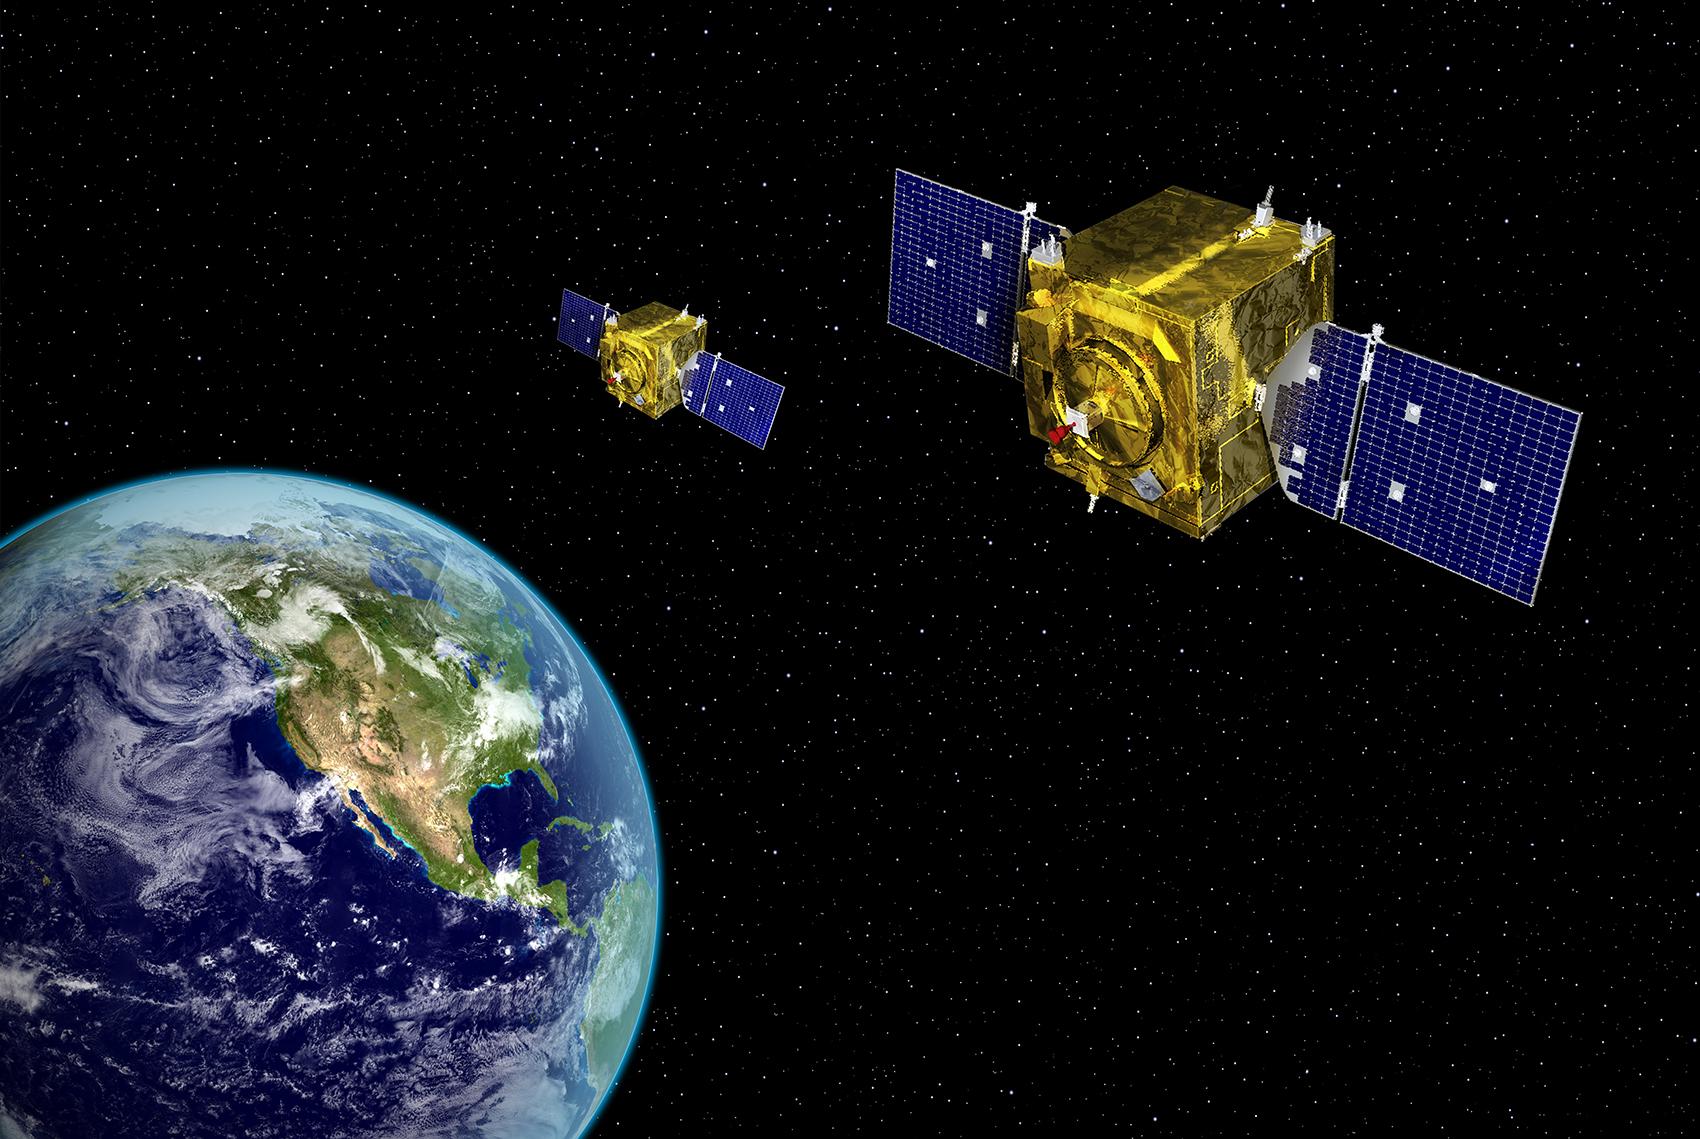 spacecraft and satellite - photo #45